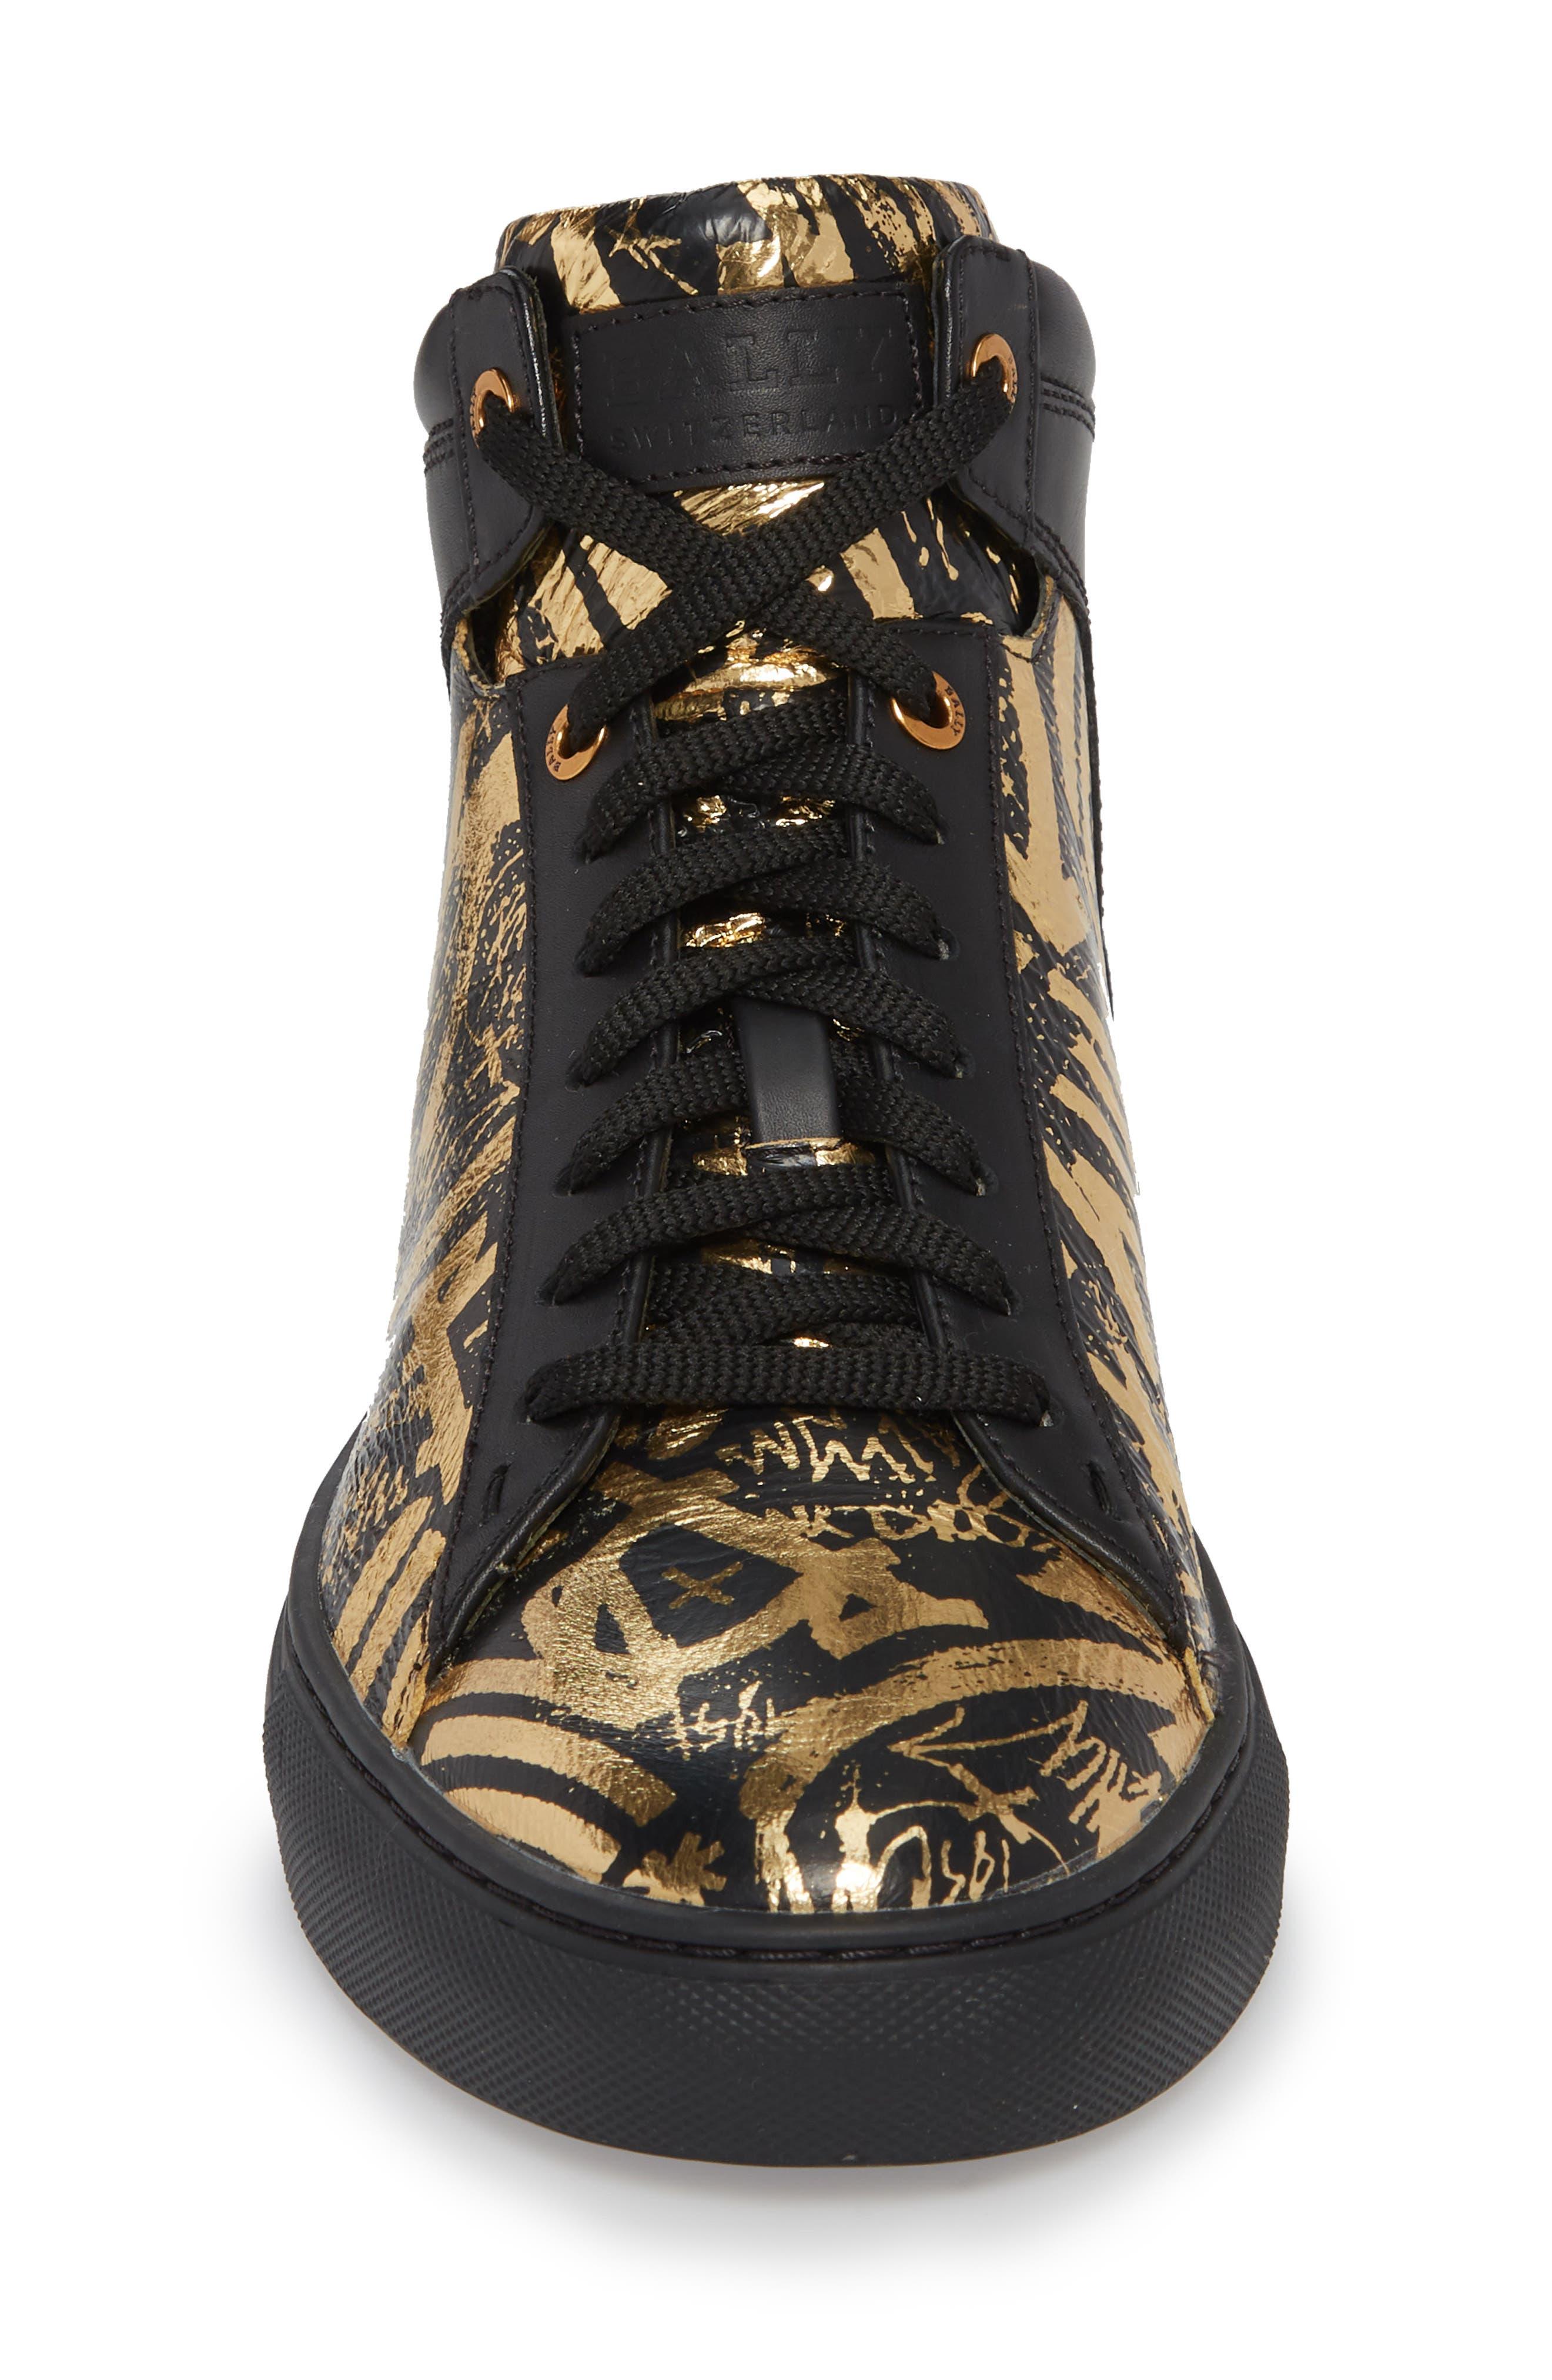 Hedo High Top Sneaker,                             Alternate thumbnail 4, color,                             GOLD